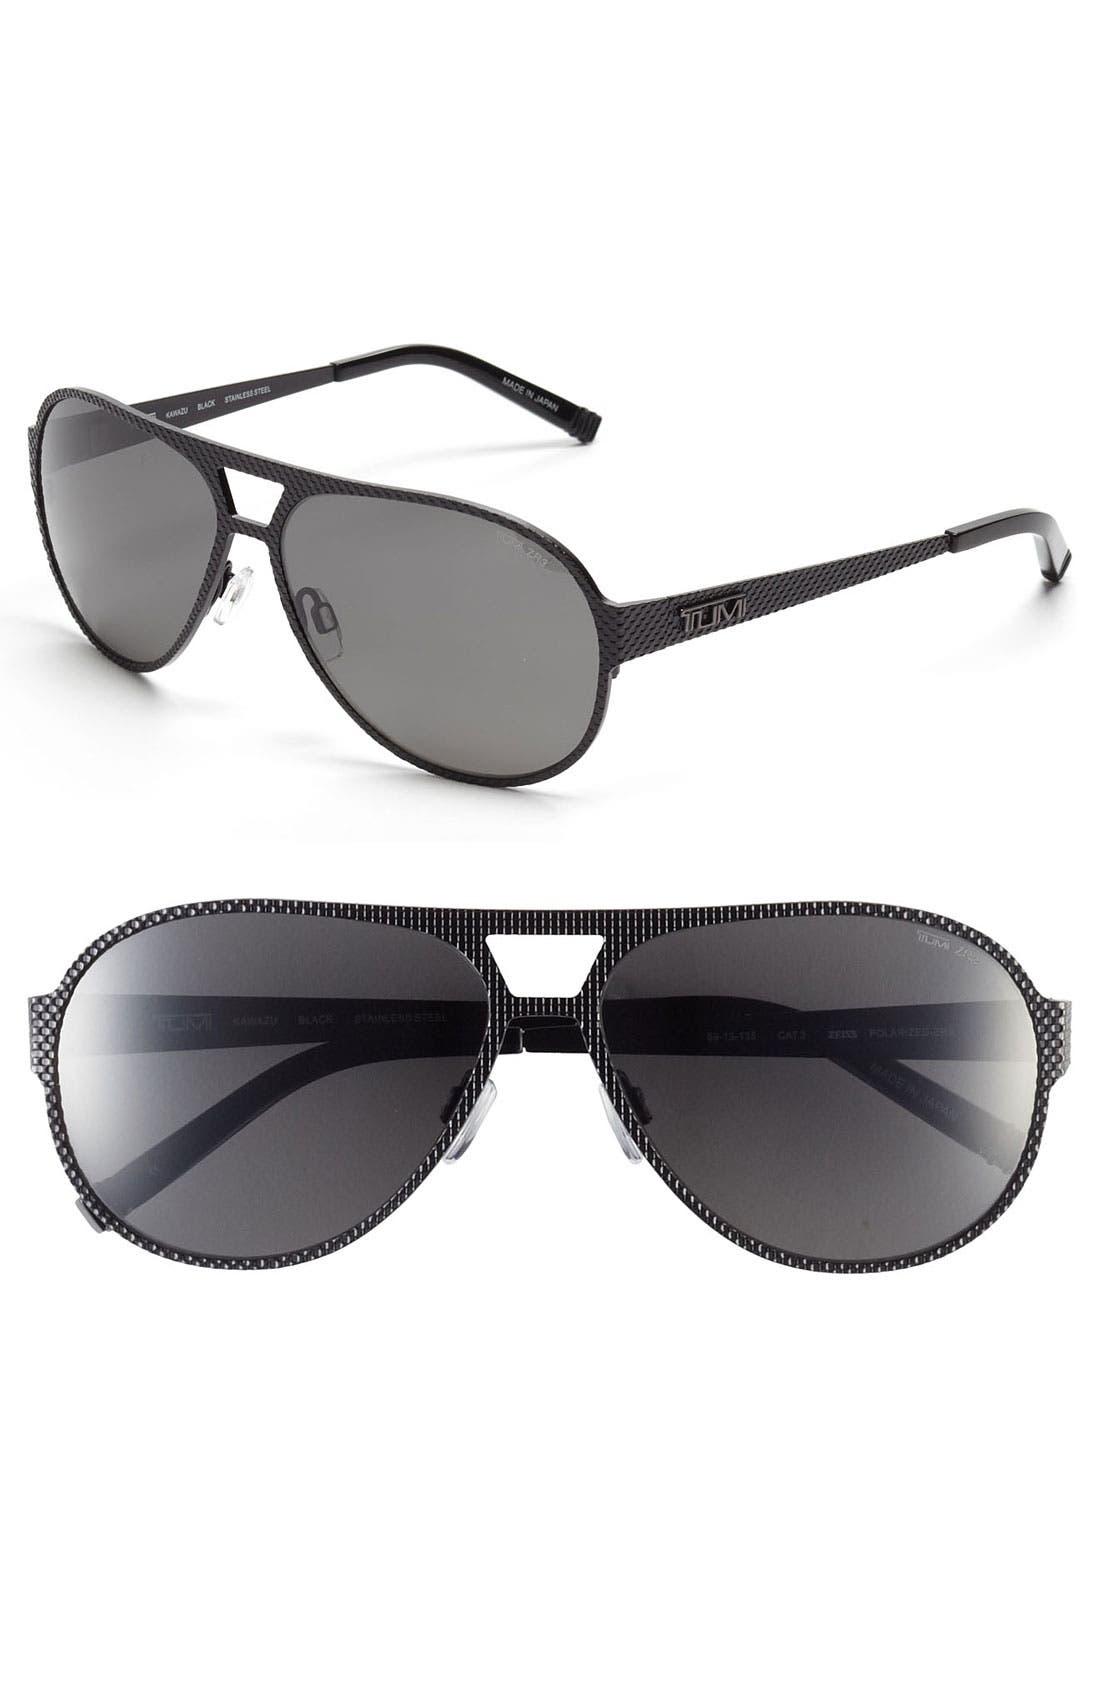 Alternate Image 1 Selected - Tumi 'Kawazu' 59mm Polarized Sunglasses